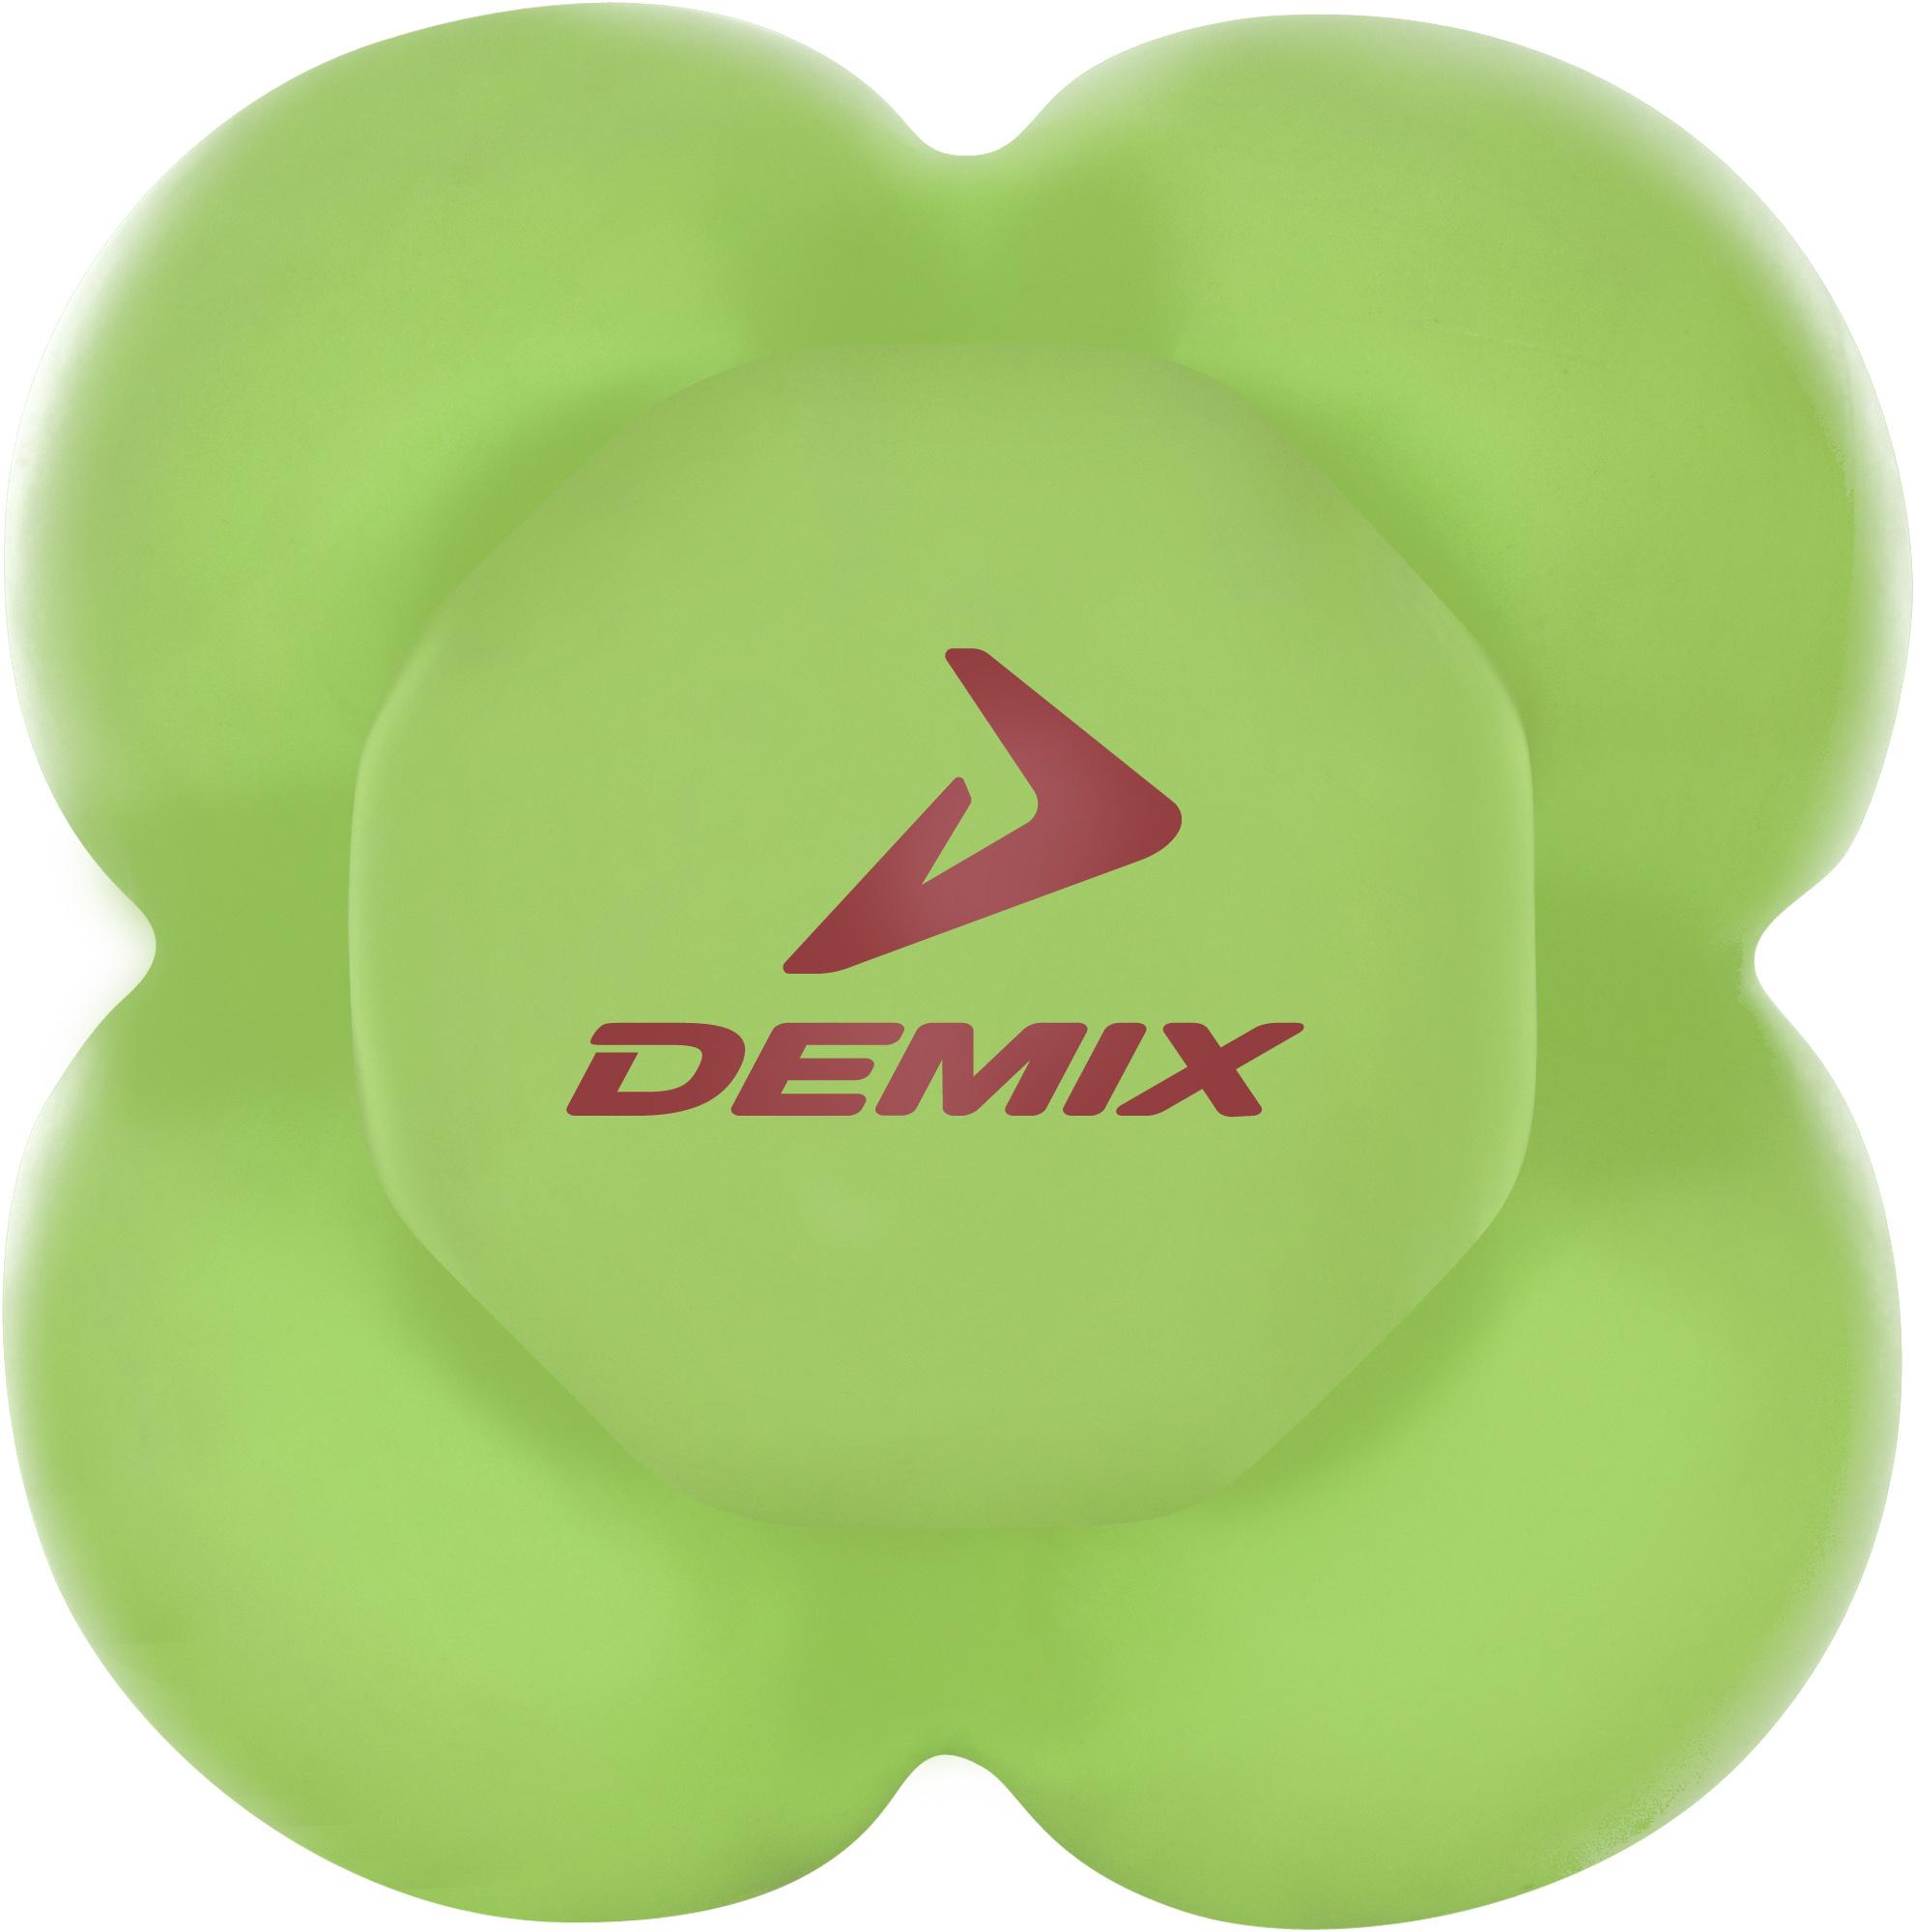 Demix Мяч для развития реакции Demix demix бейсболка demix